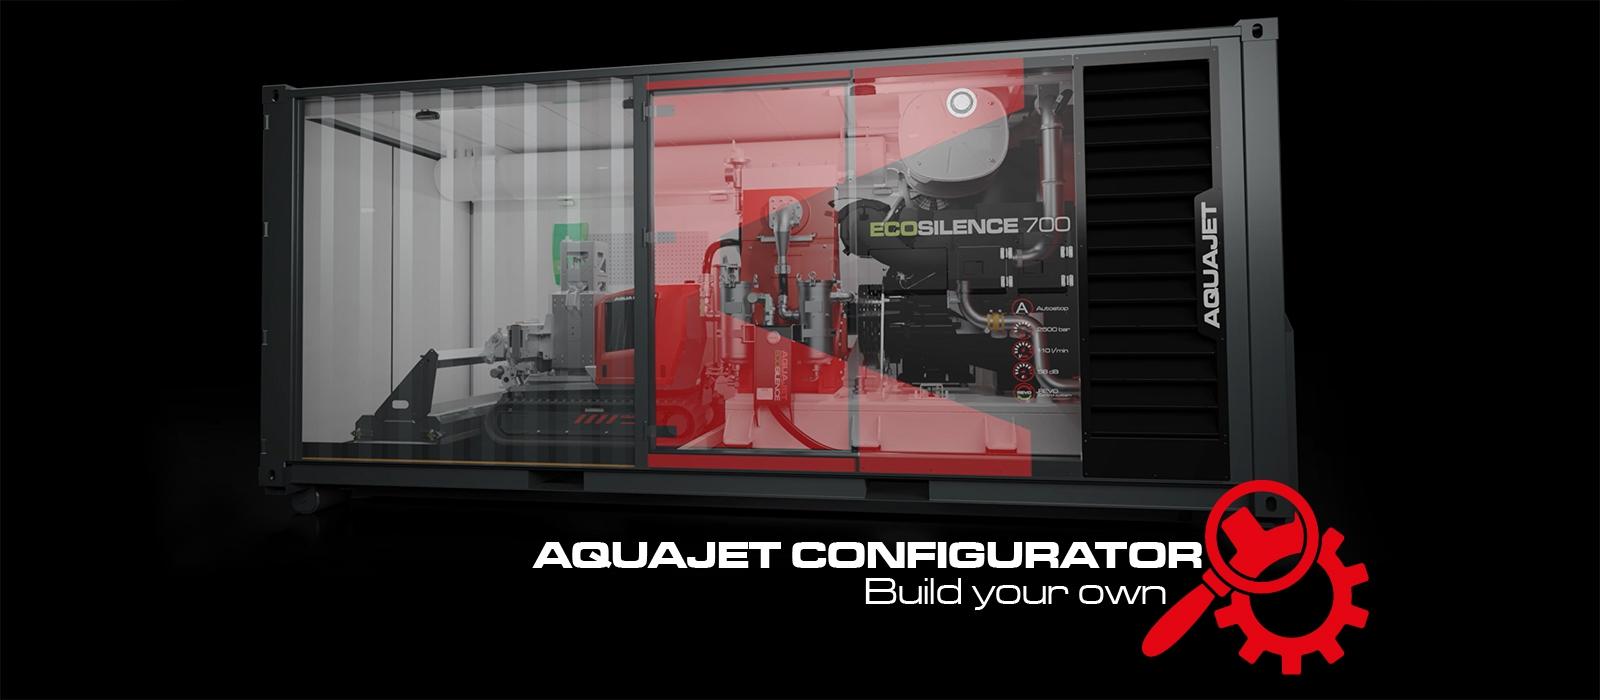 configurator aquajet build your own hydrodemolition ecosilence 3.0 equipment